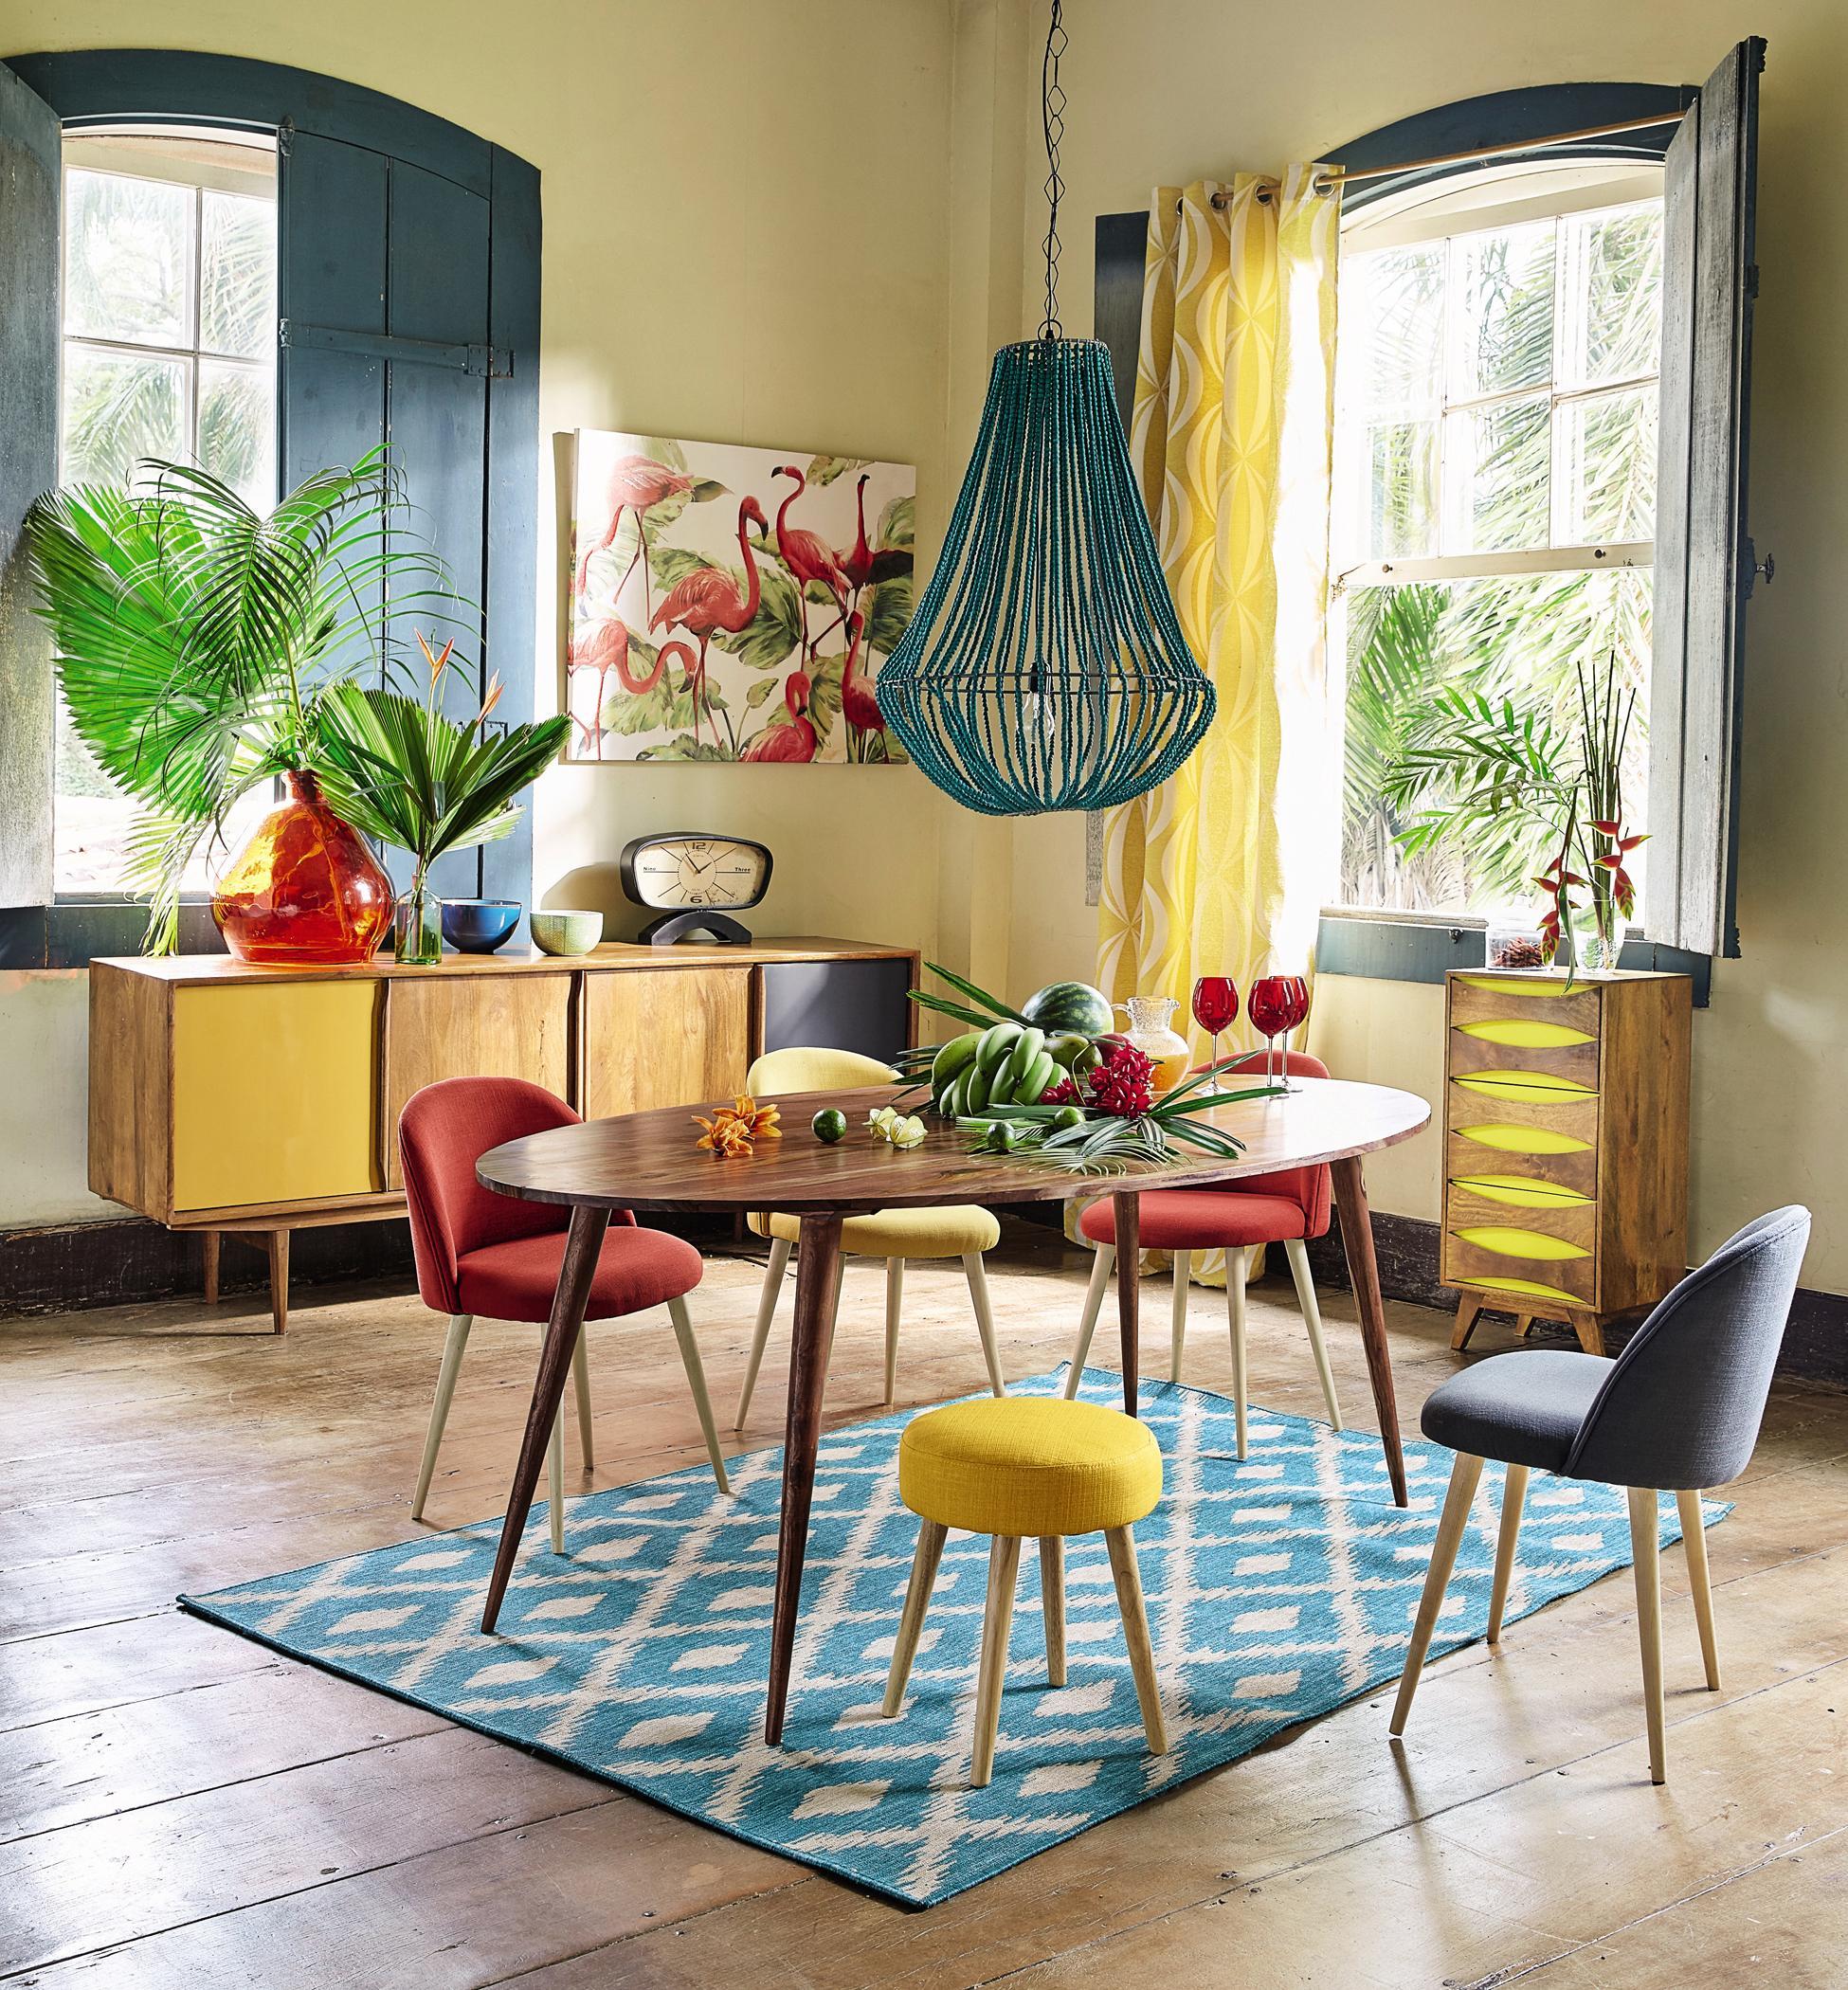 das metallregal der klassiker unter den regalen. Black Bedroom Furniture Sets. Home Design Ideas